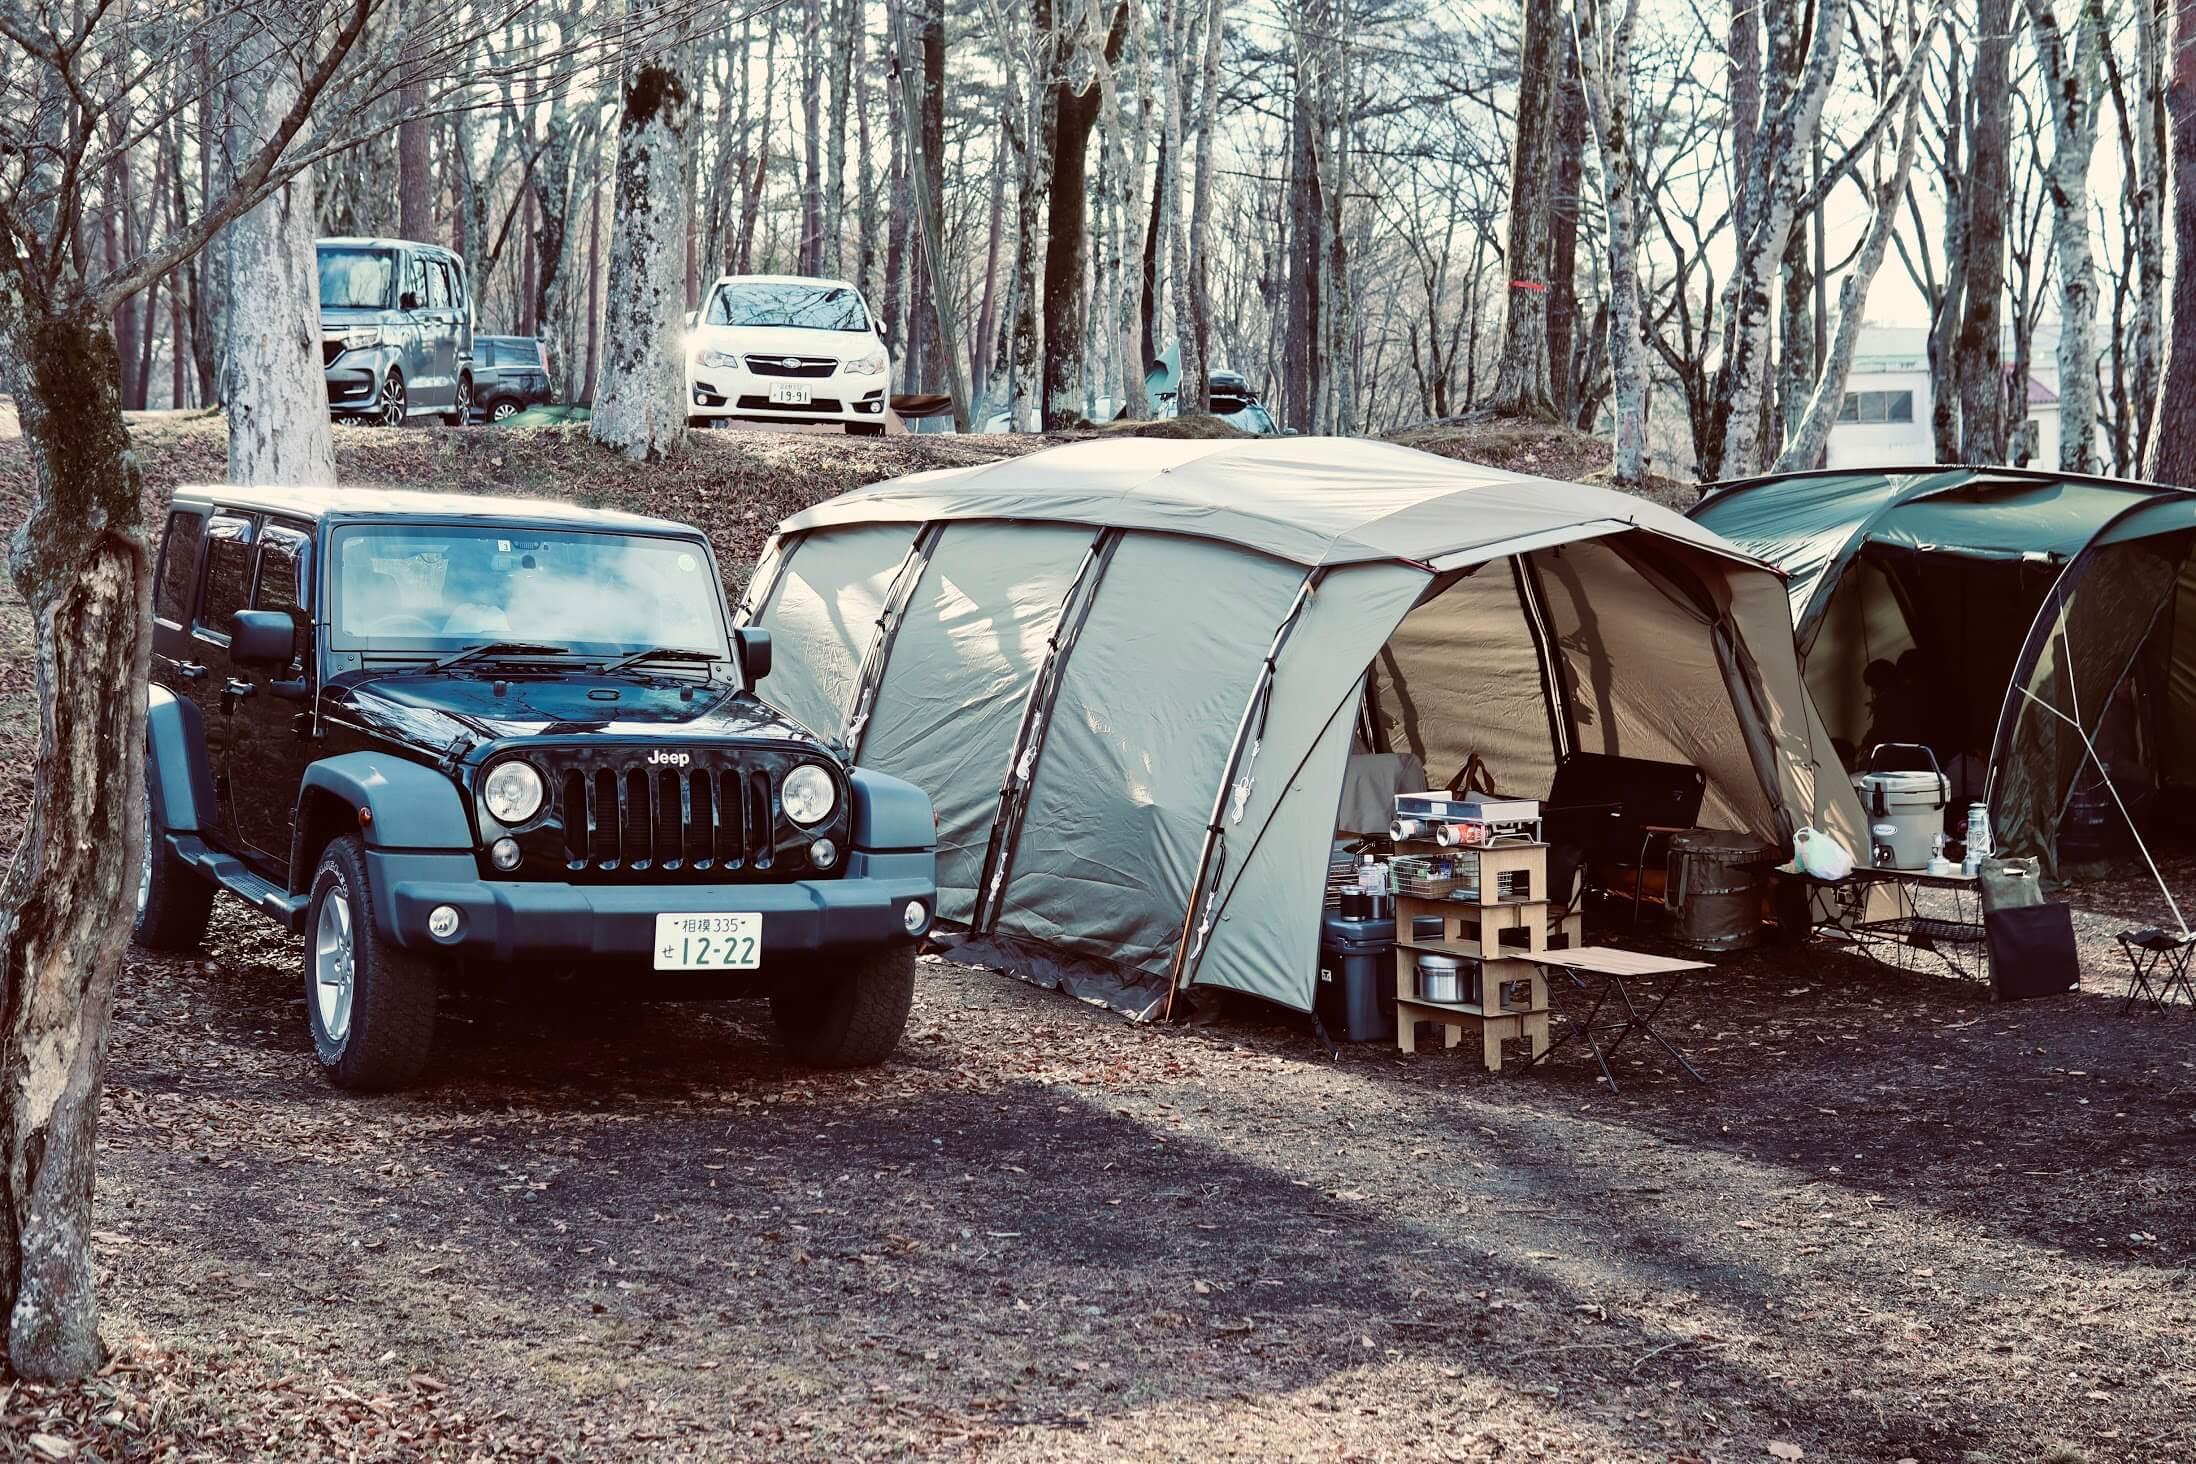 Jeep ラングラー + ogawa アポロン